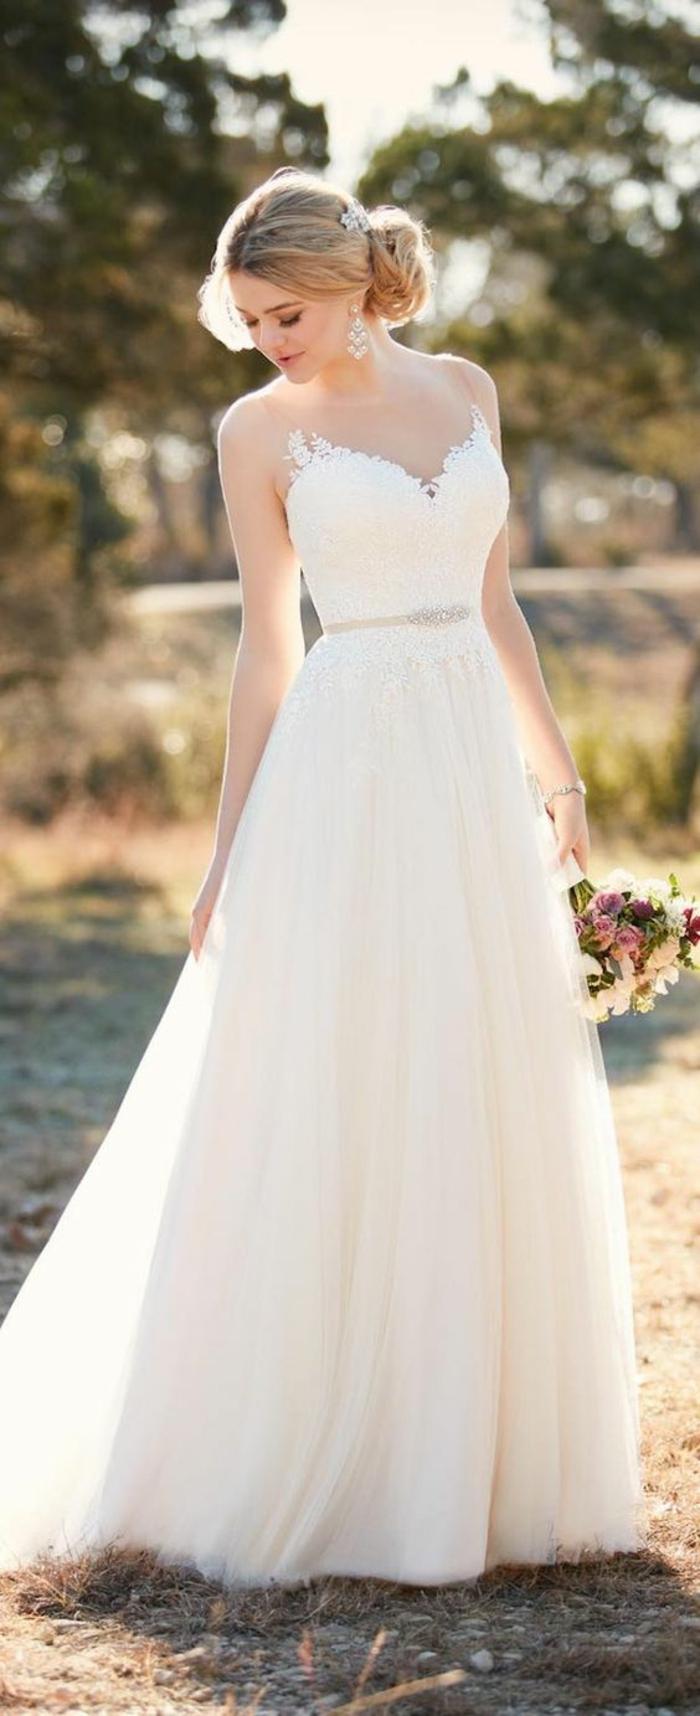 mariage-robe-de-mariée-longue-blanche-idee-robe-longue-sans-manches